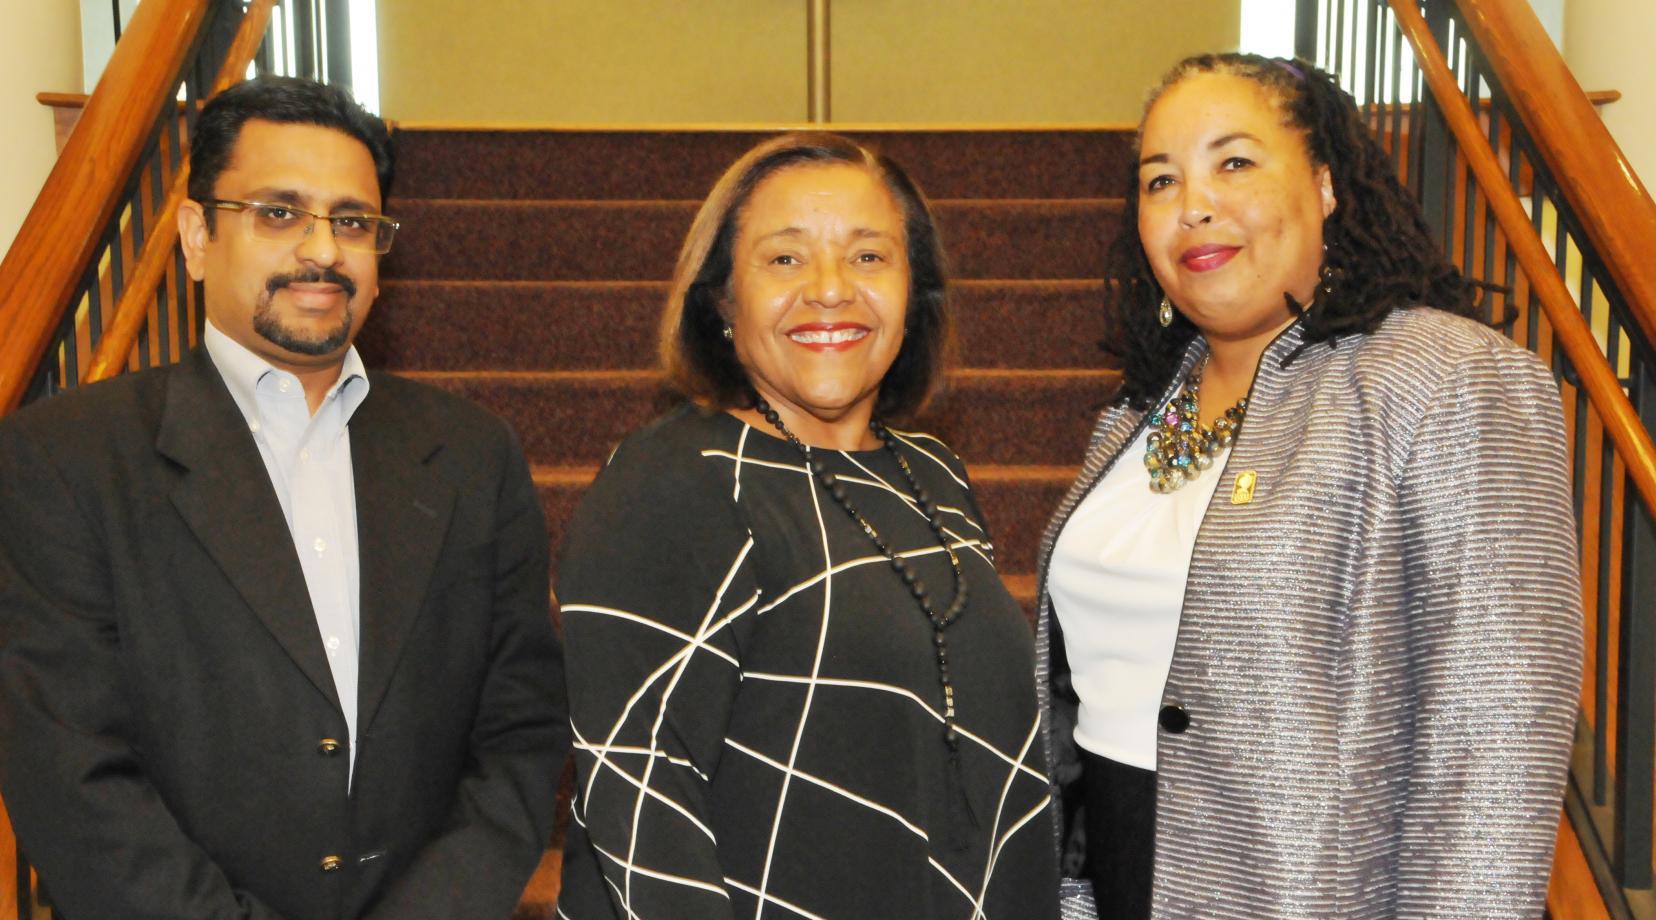 DSU College of Business leadership: (l-r) Dr. Praveen Pinjani, associate dean; COB Dean Donna Covington; and Dr. Lynda Murray-Jackson, associate professor.